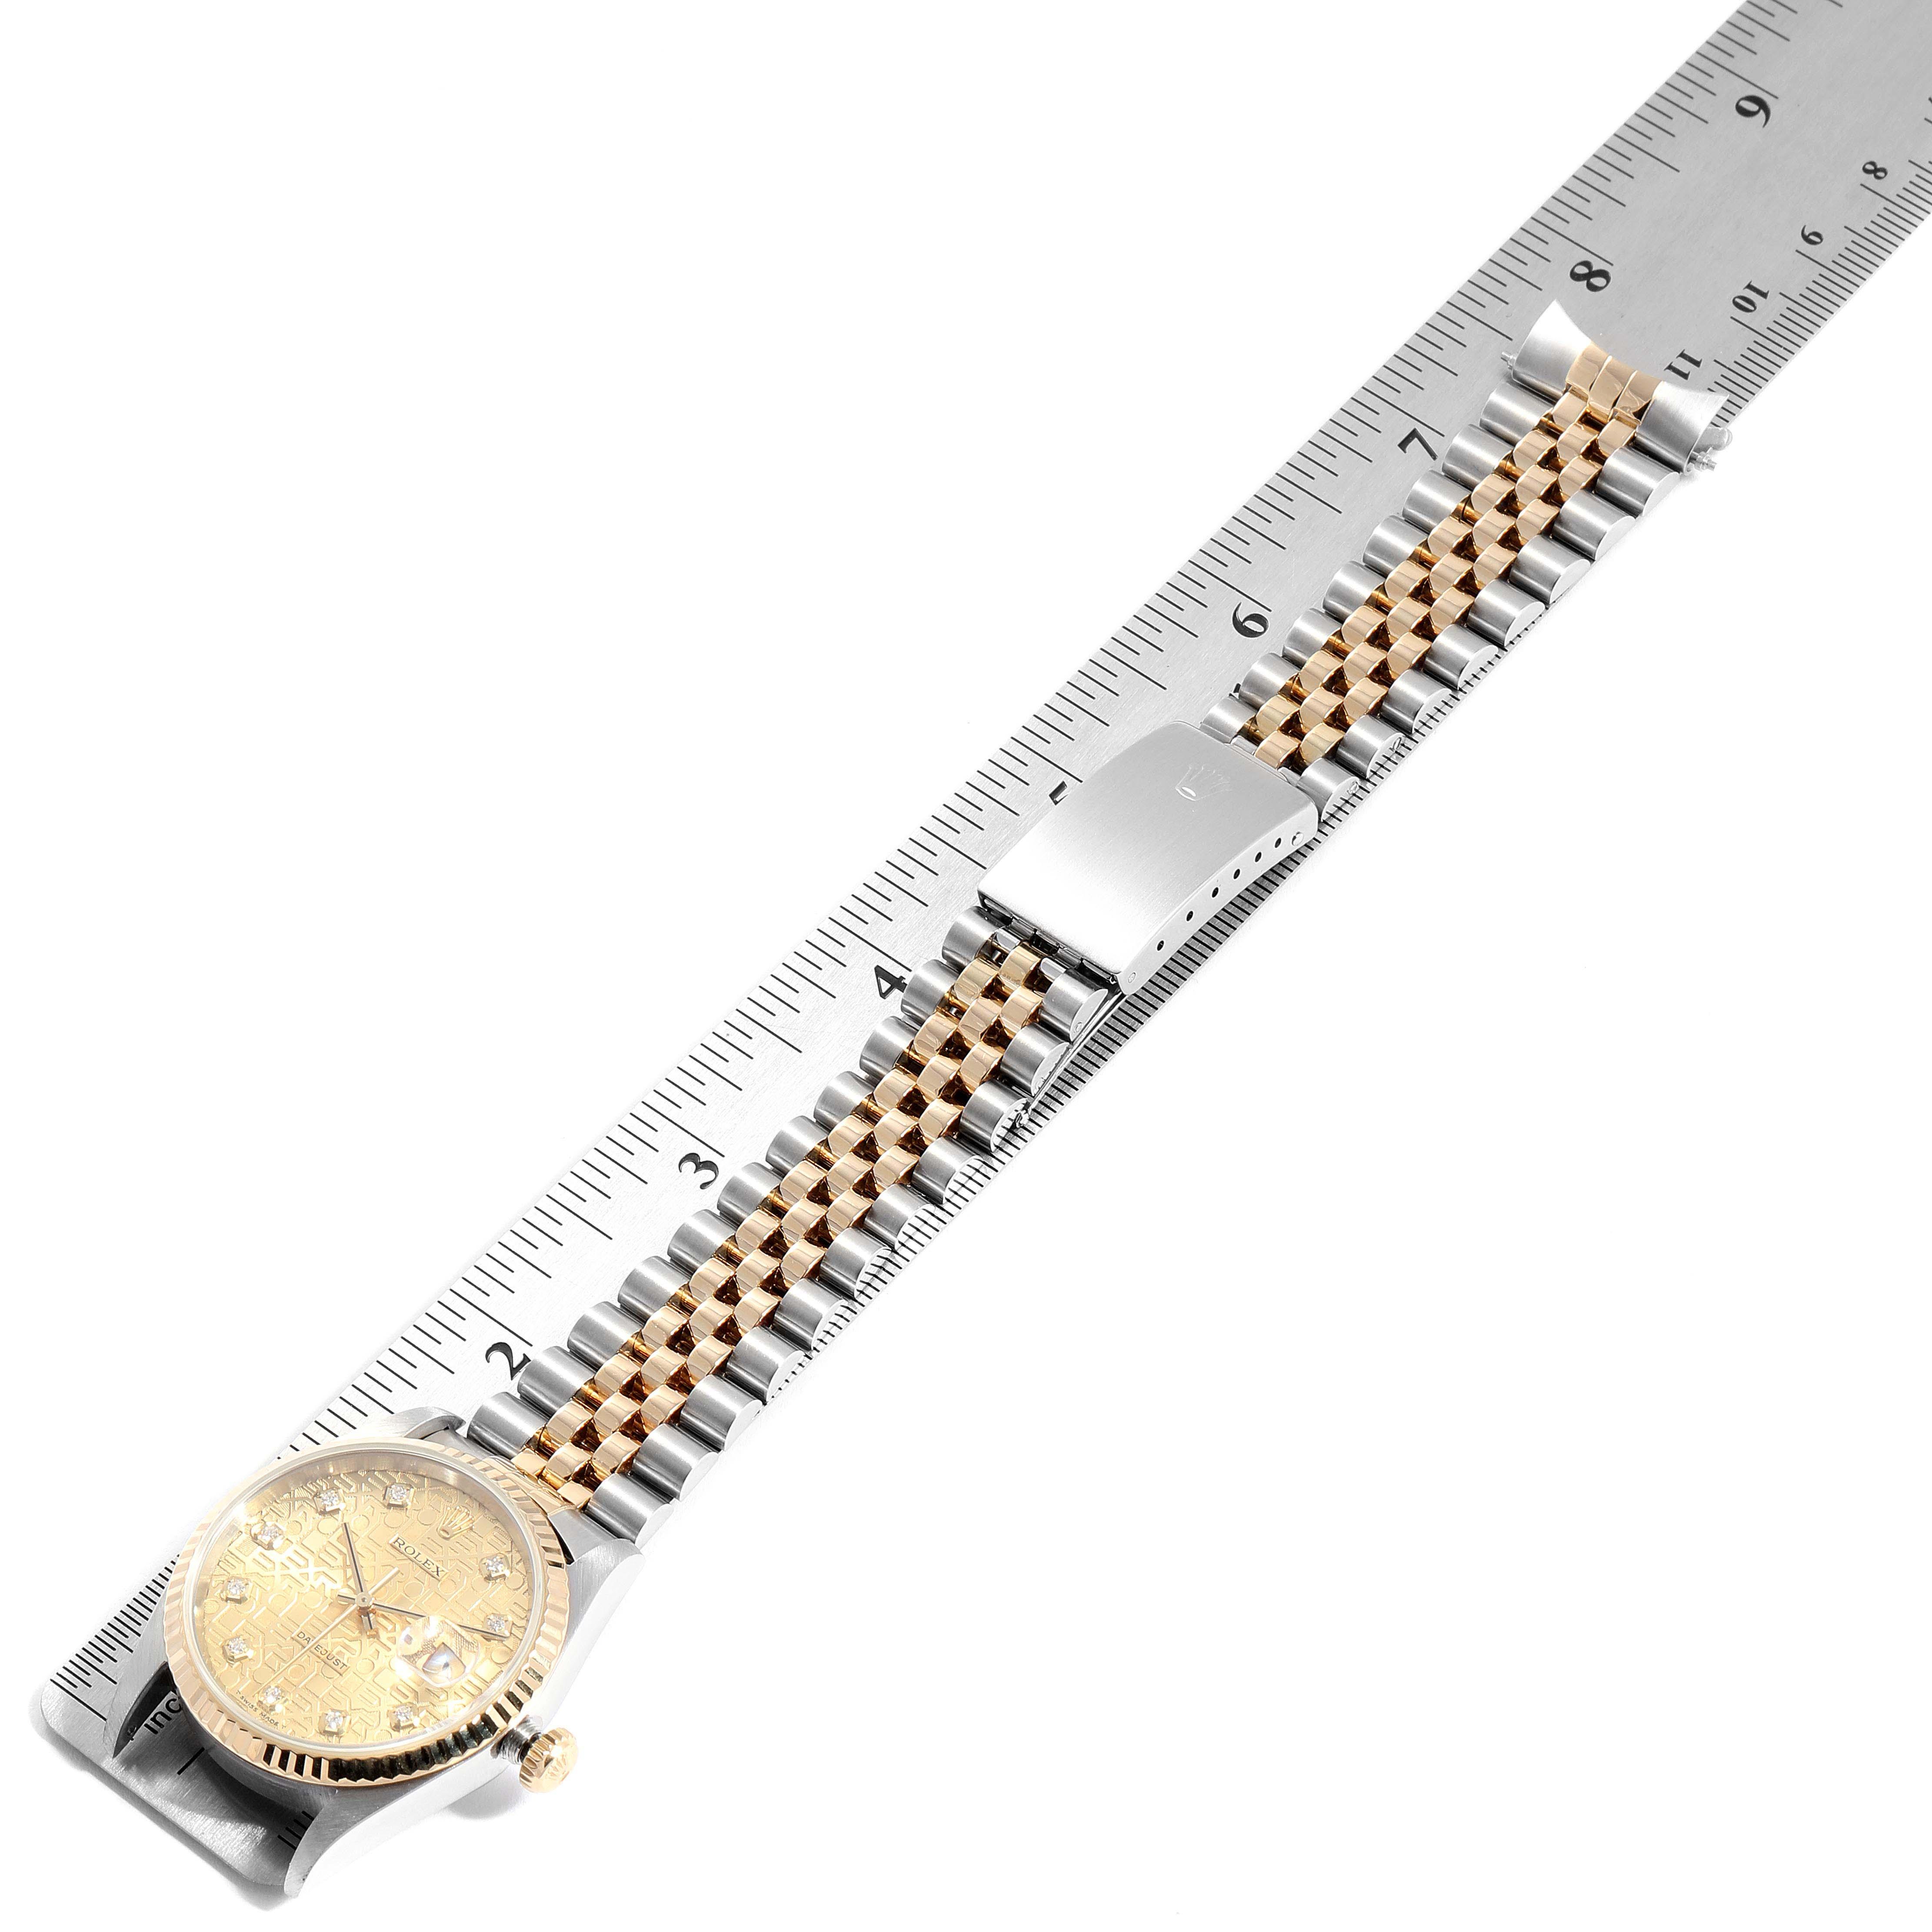 Rolex Datejust Steel Yellow Gold Diamond Mens Watch 16233 Box SwissWatchExpo